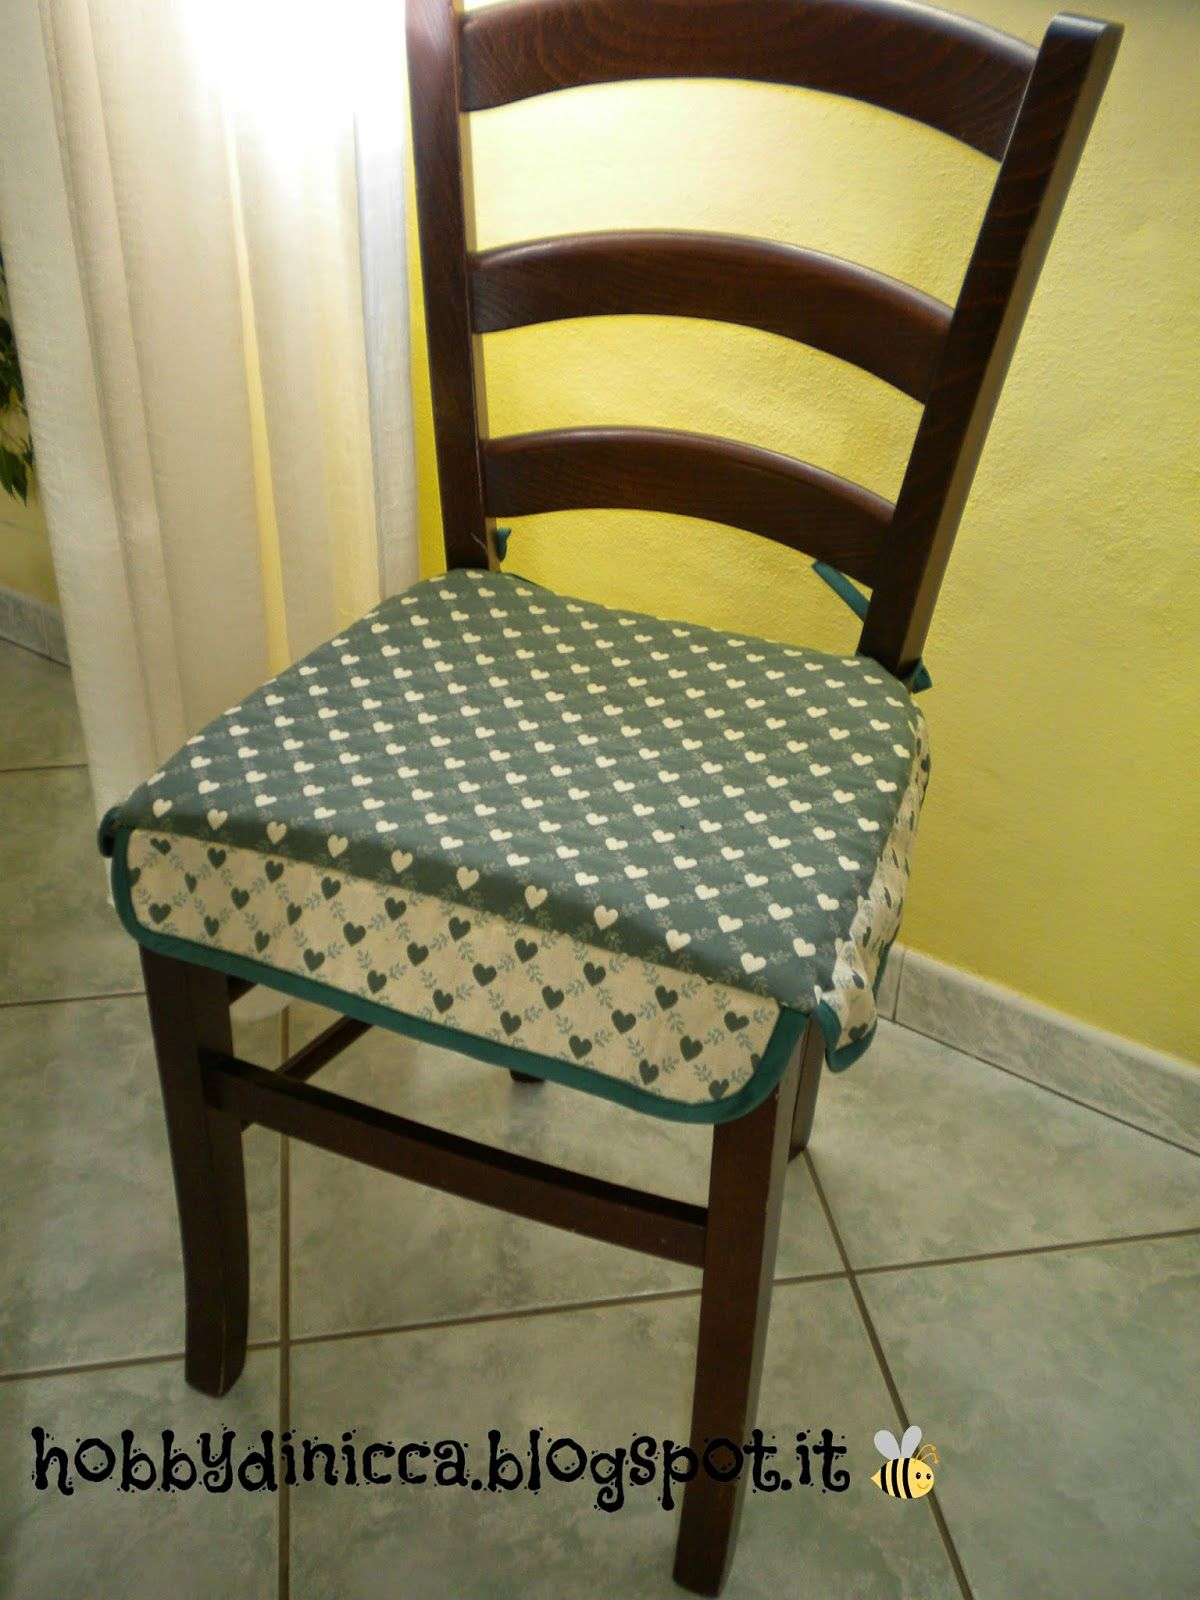 Hobby di nicca cuscino per sedie tutorial hobby for Cucina giocattolo fai da te